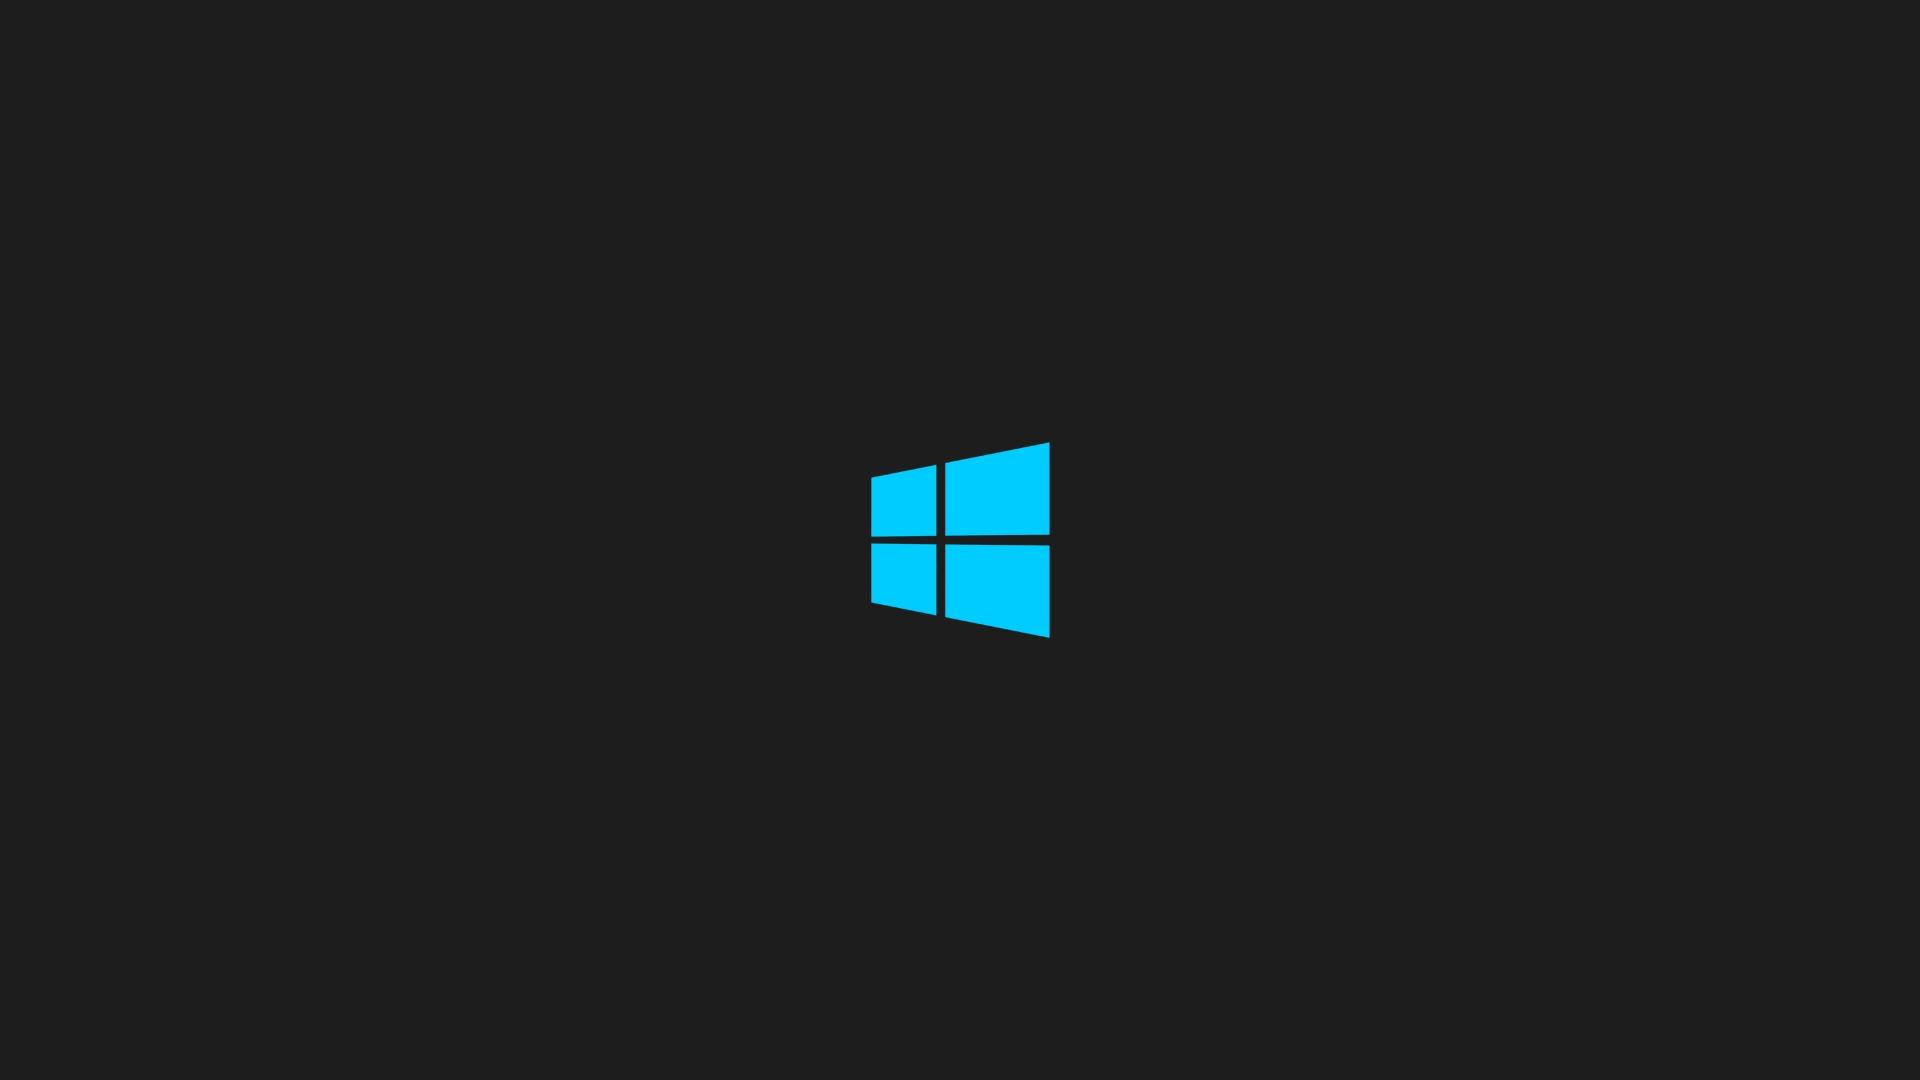 windows 8 black wallpapers group (91+)